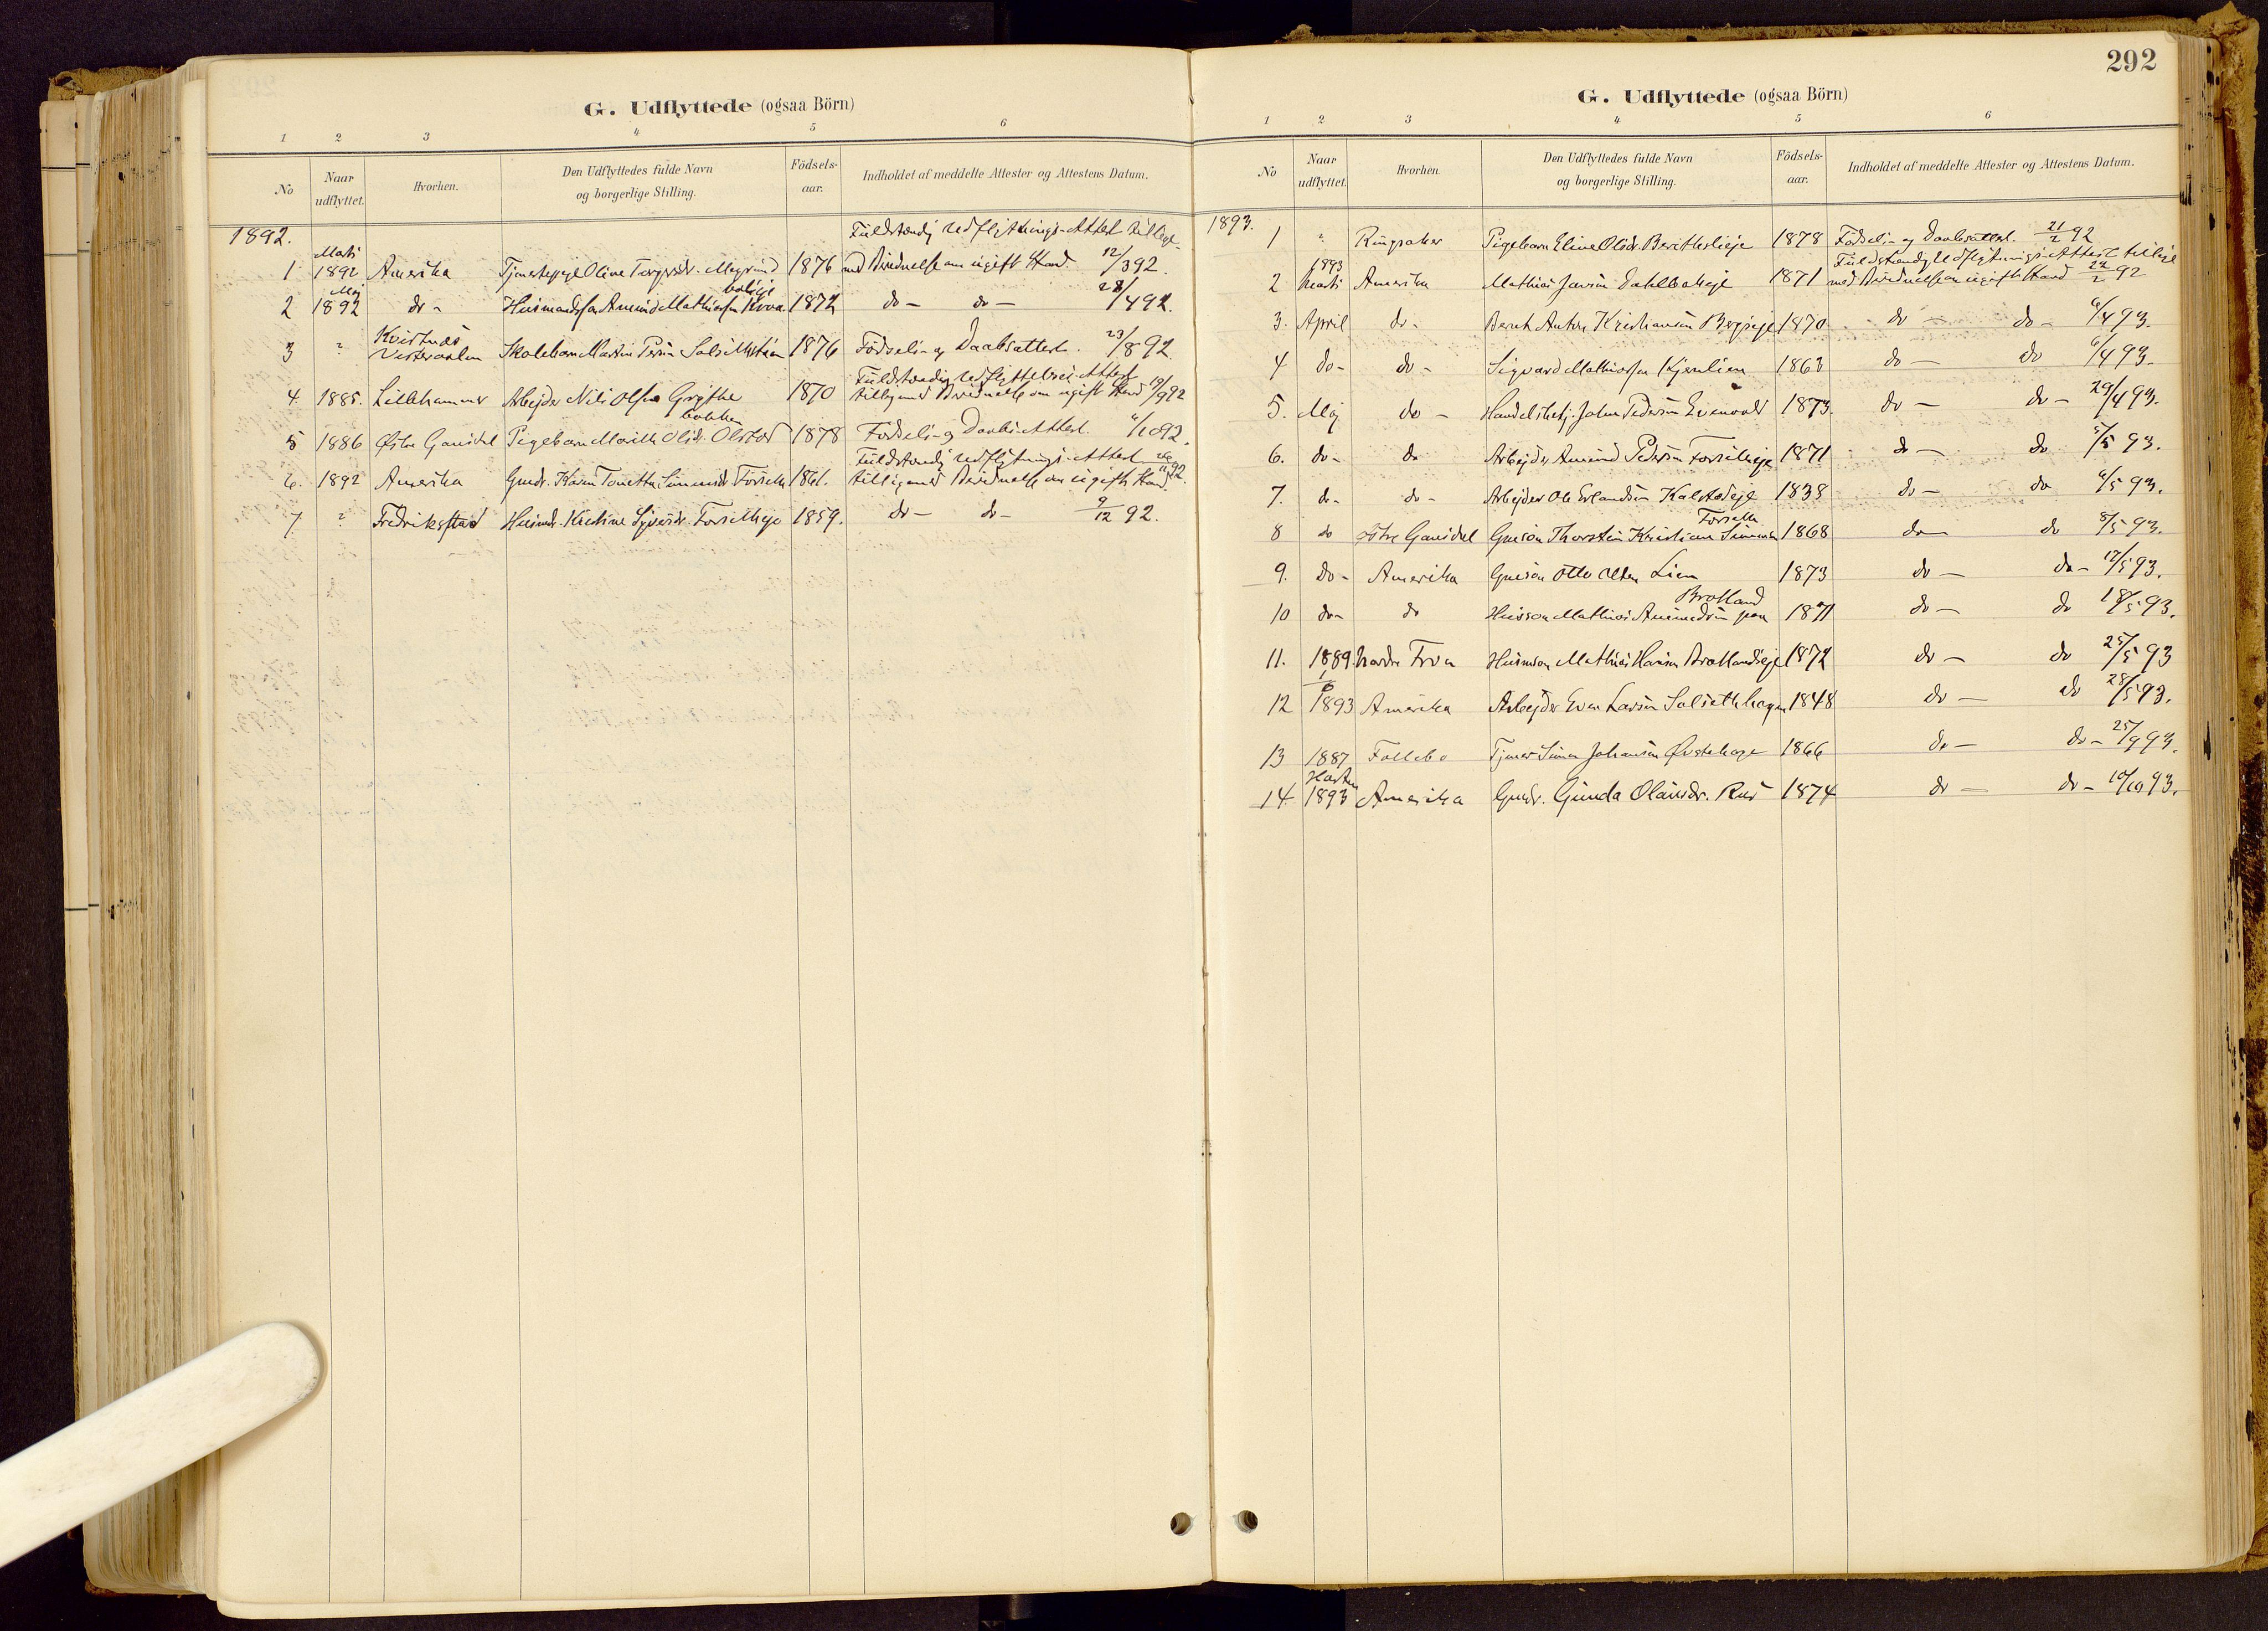 SAH, Vestre Gausdal prestekontor, Ministerialbok nr. 1, 1887-1914, s. 292